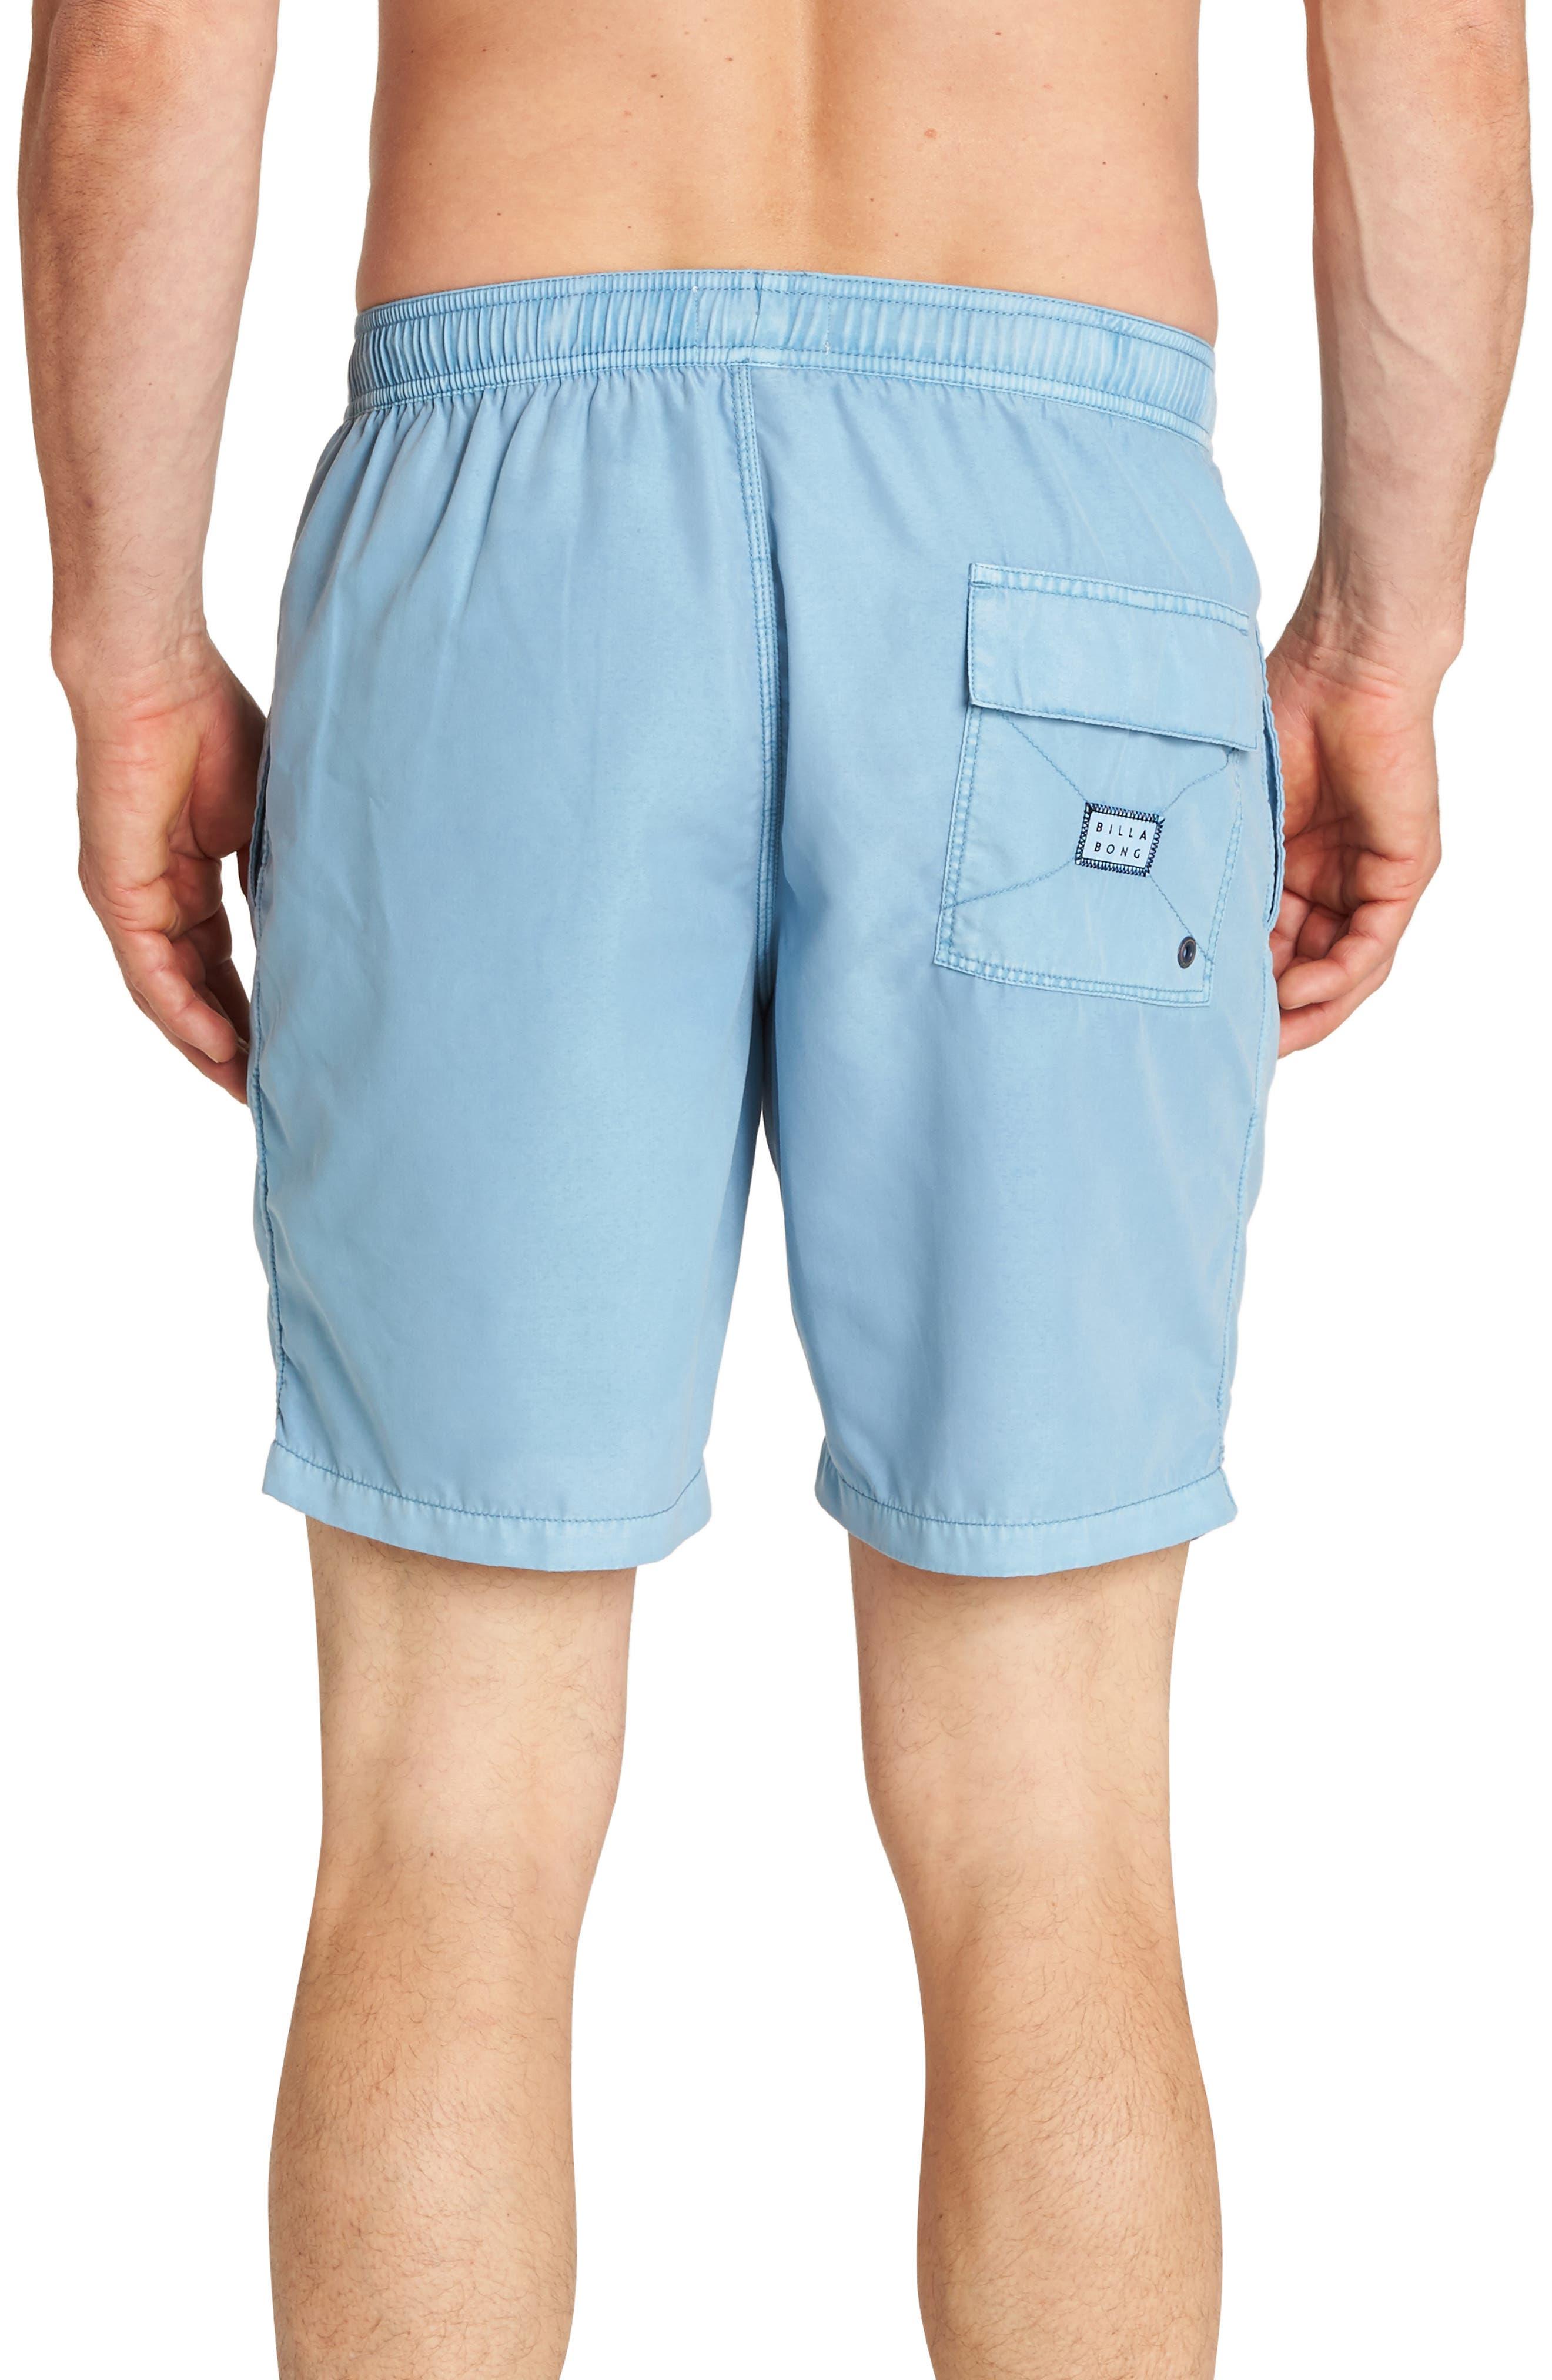 All Day Layback Board Shorts,                             Alternate thumbnail 2, color,                             428